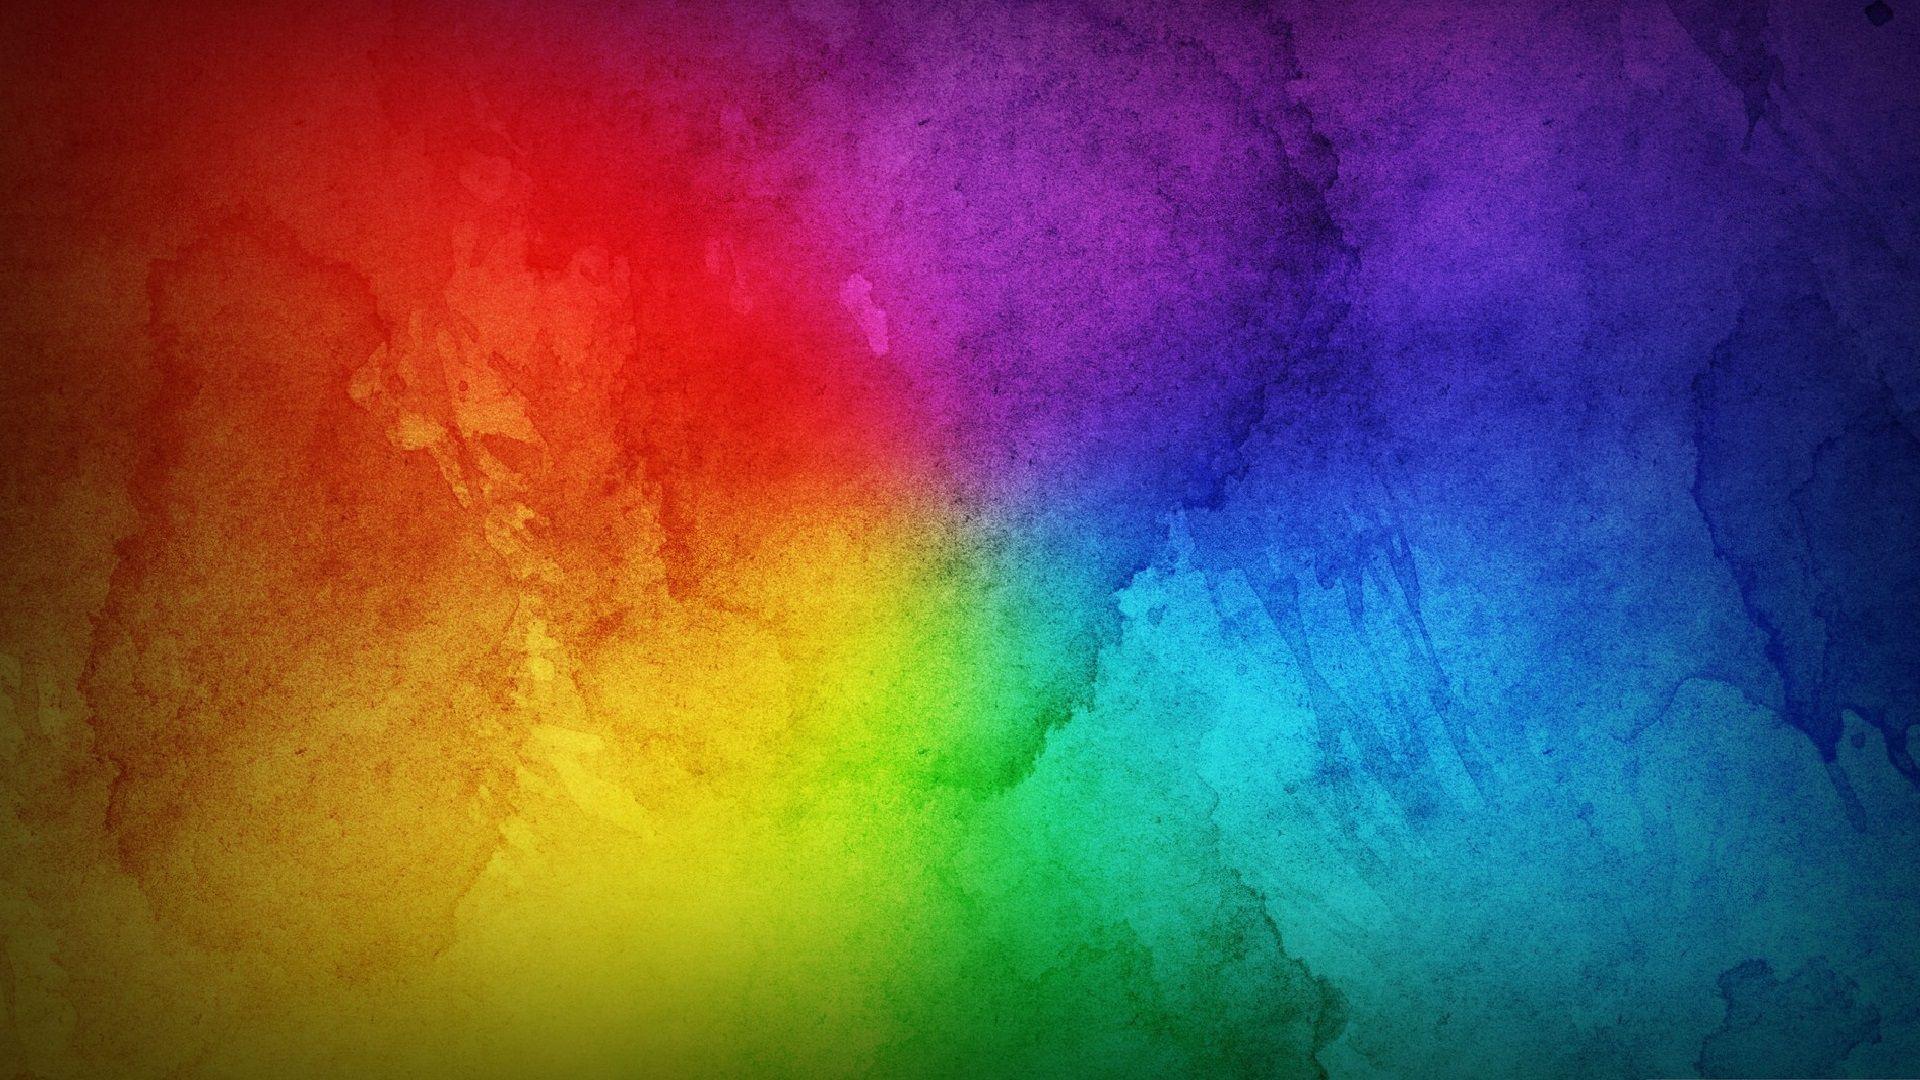 Wallpaper Rainbow Six Siege Desktop With Images Apple Logo